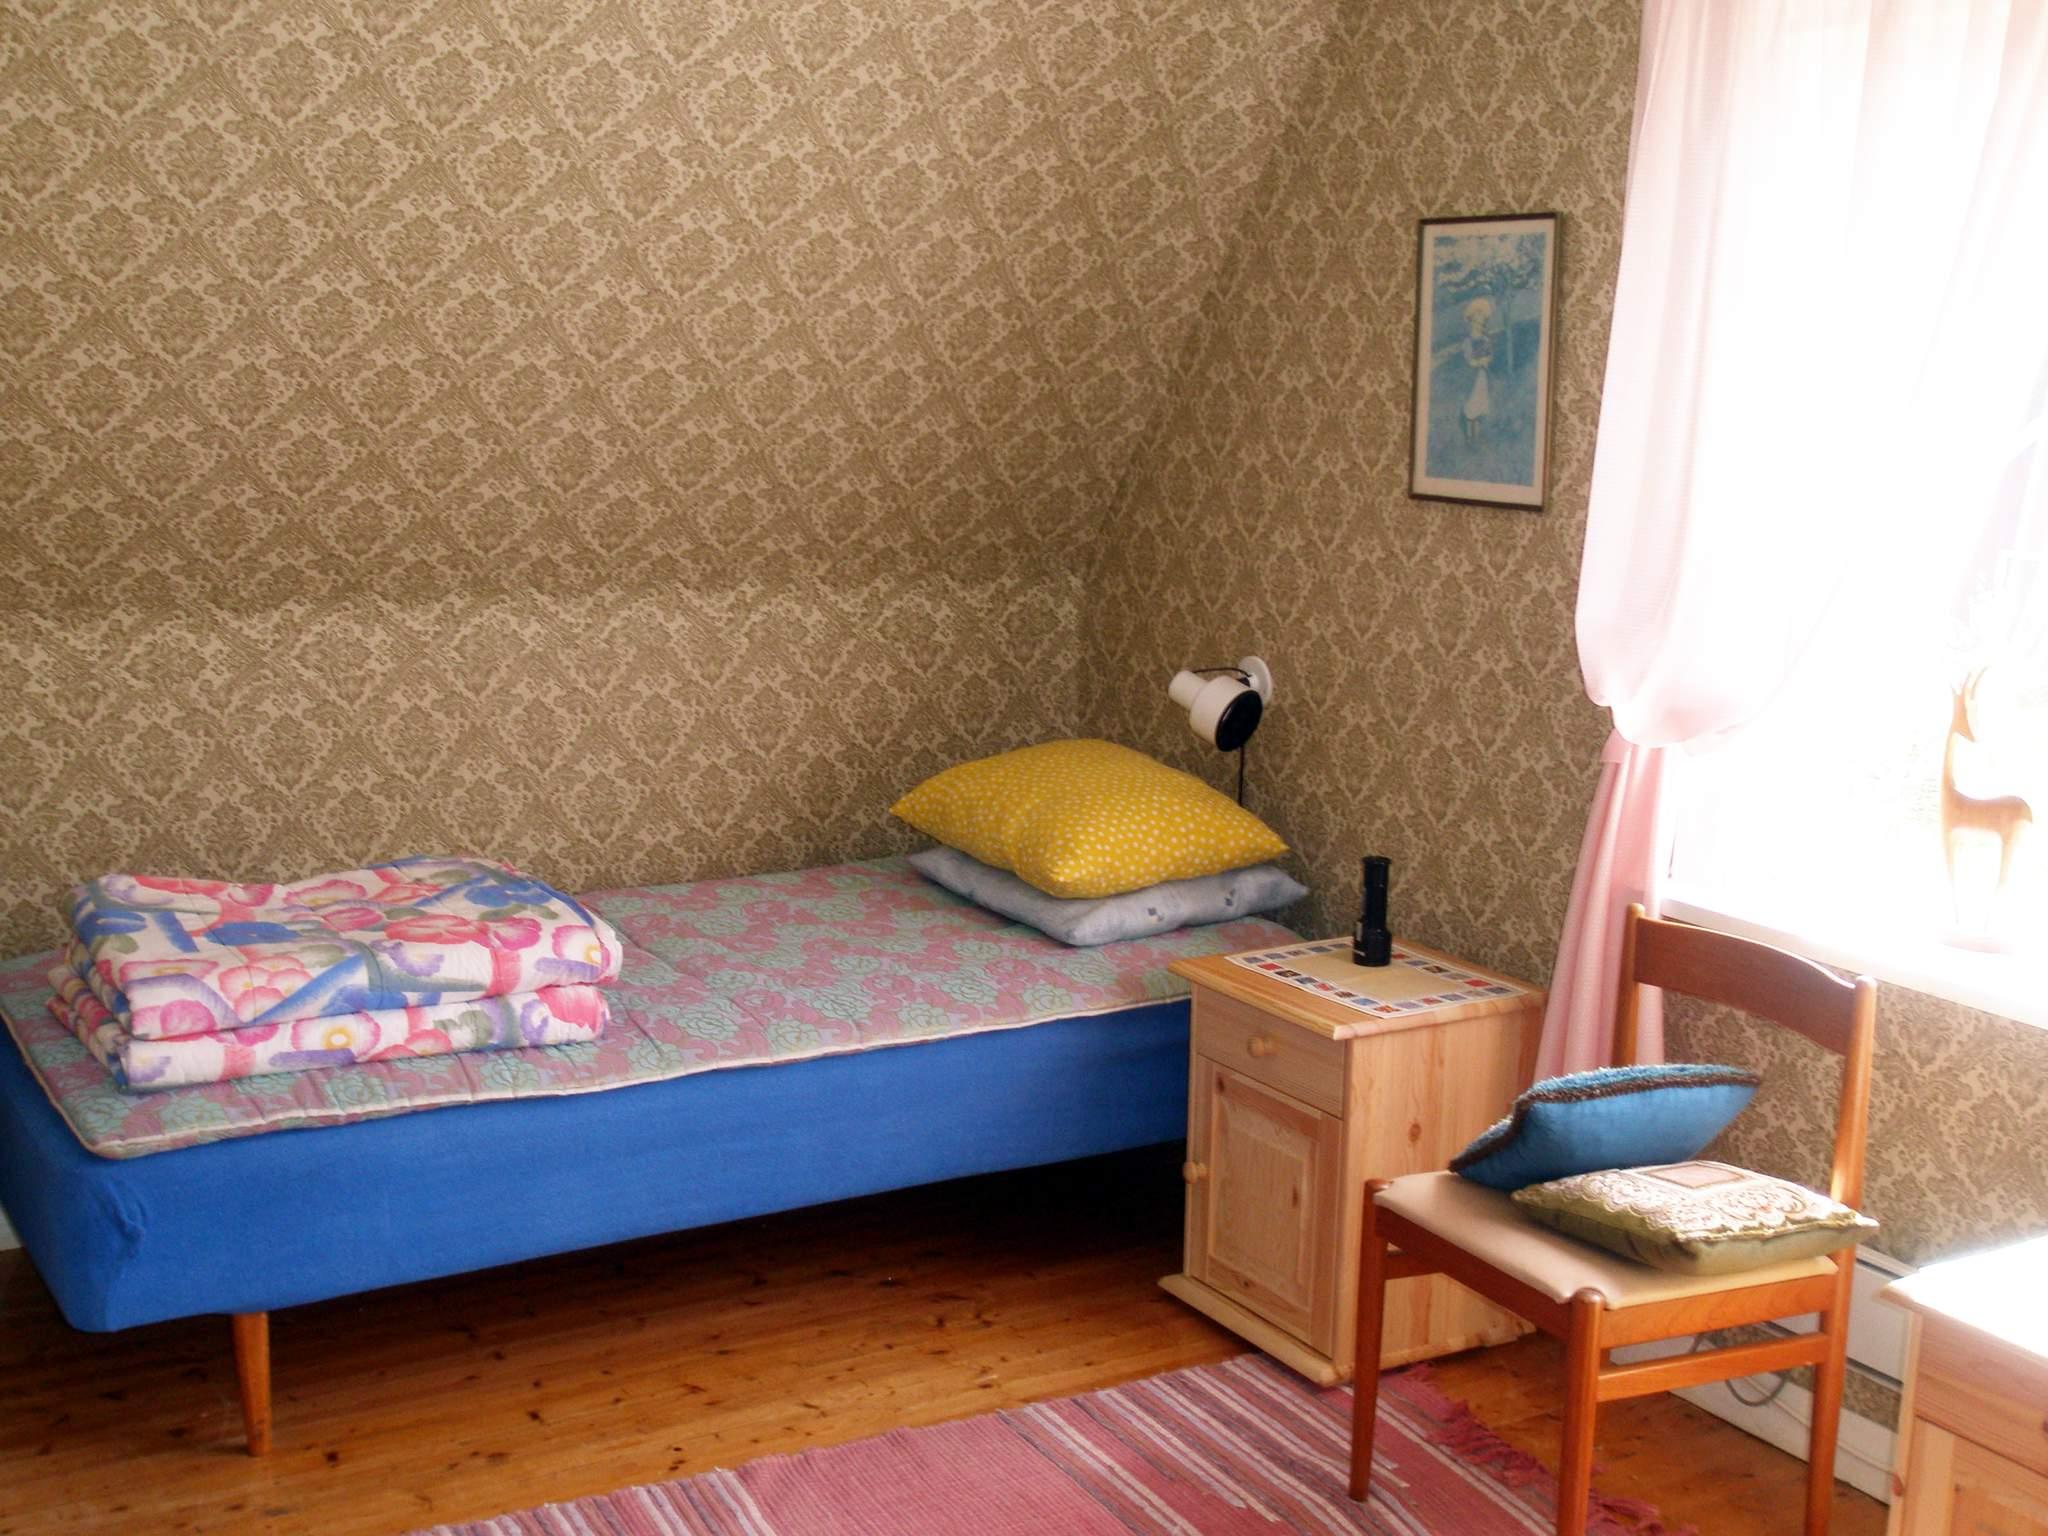 Ferienhaus Sundhultsbrunn (87123), Sunhultsbrunn, Jönköpings län, Südschweden, Schweden, Bild 9